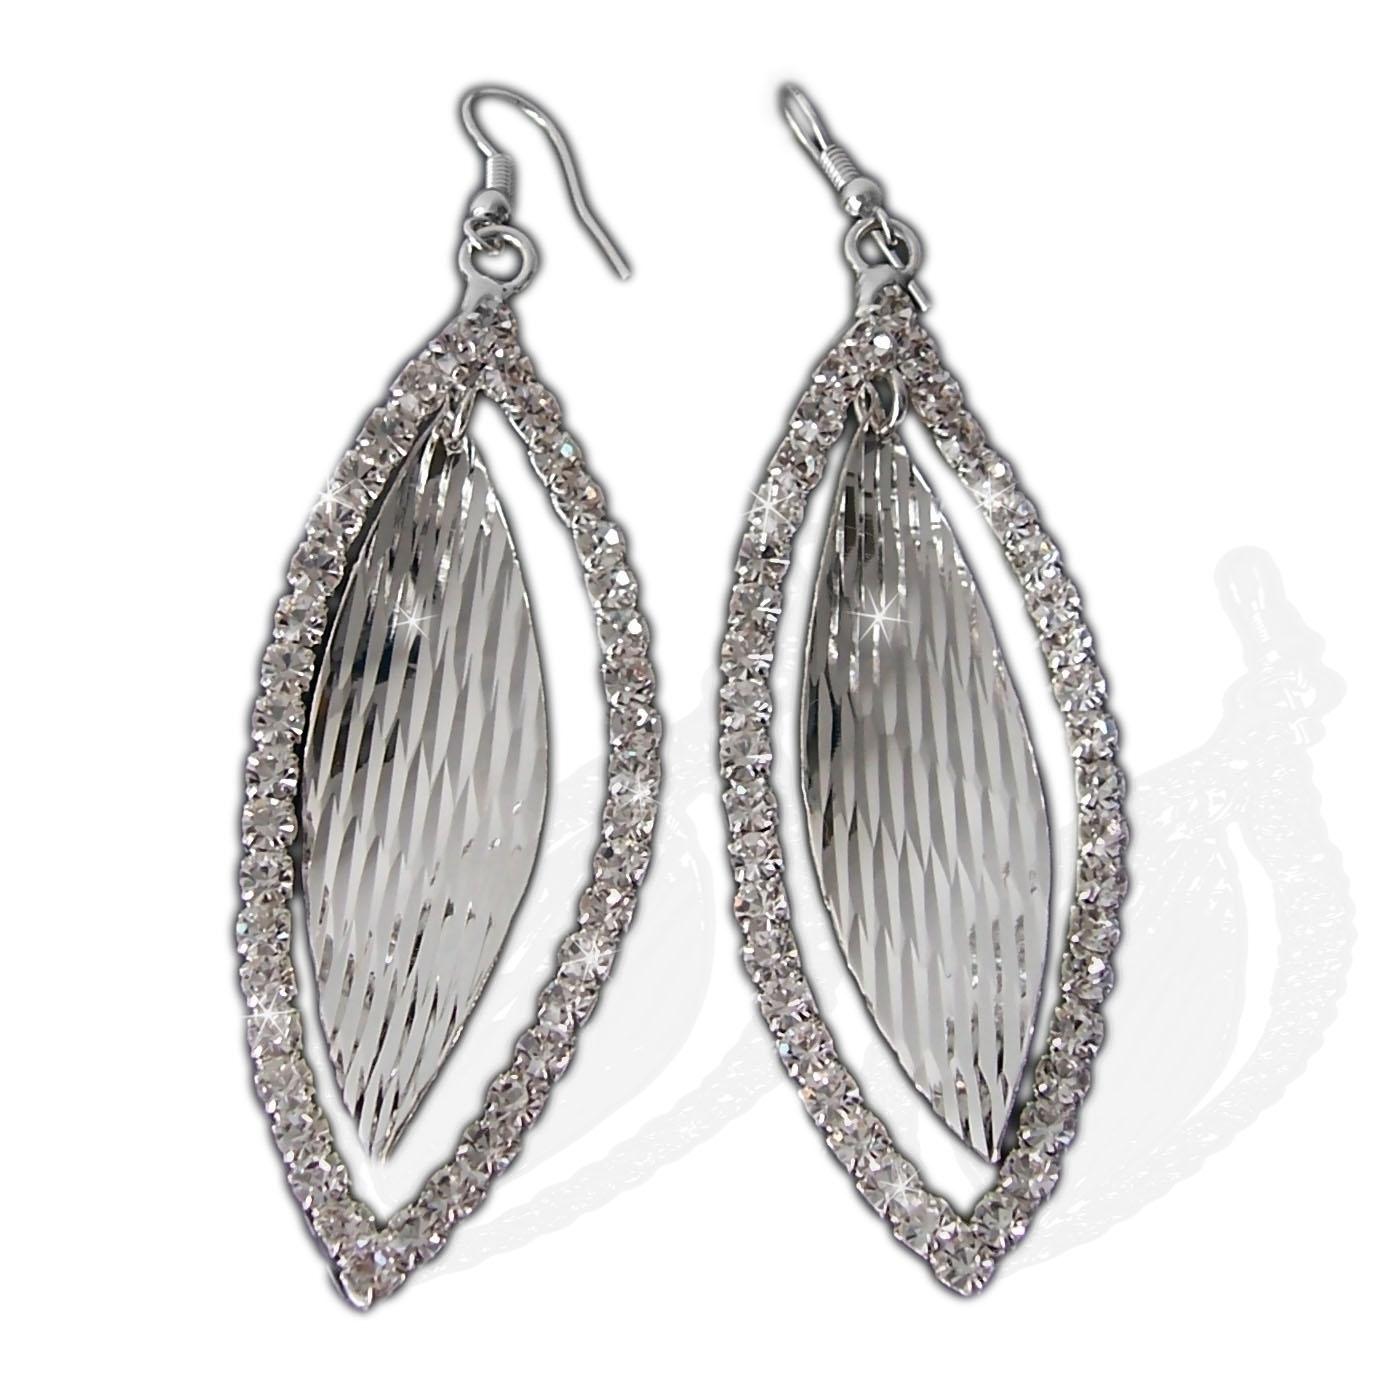 Ohrringe Silber Plattiert Ohrhänger 8cm Blatt Schmuck Strass O38